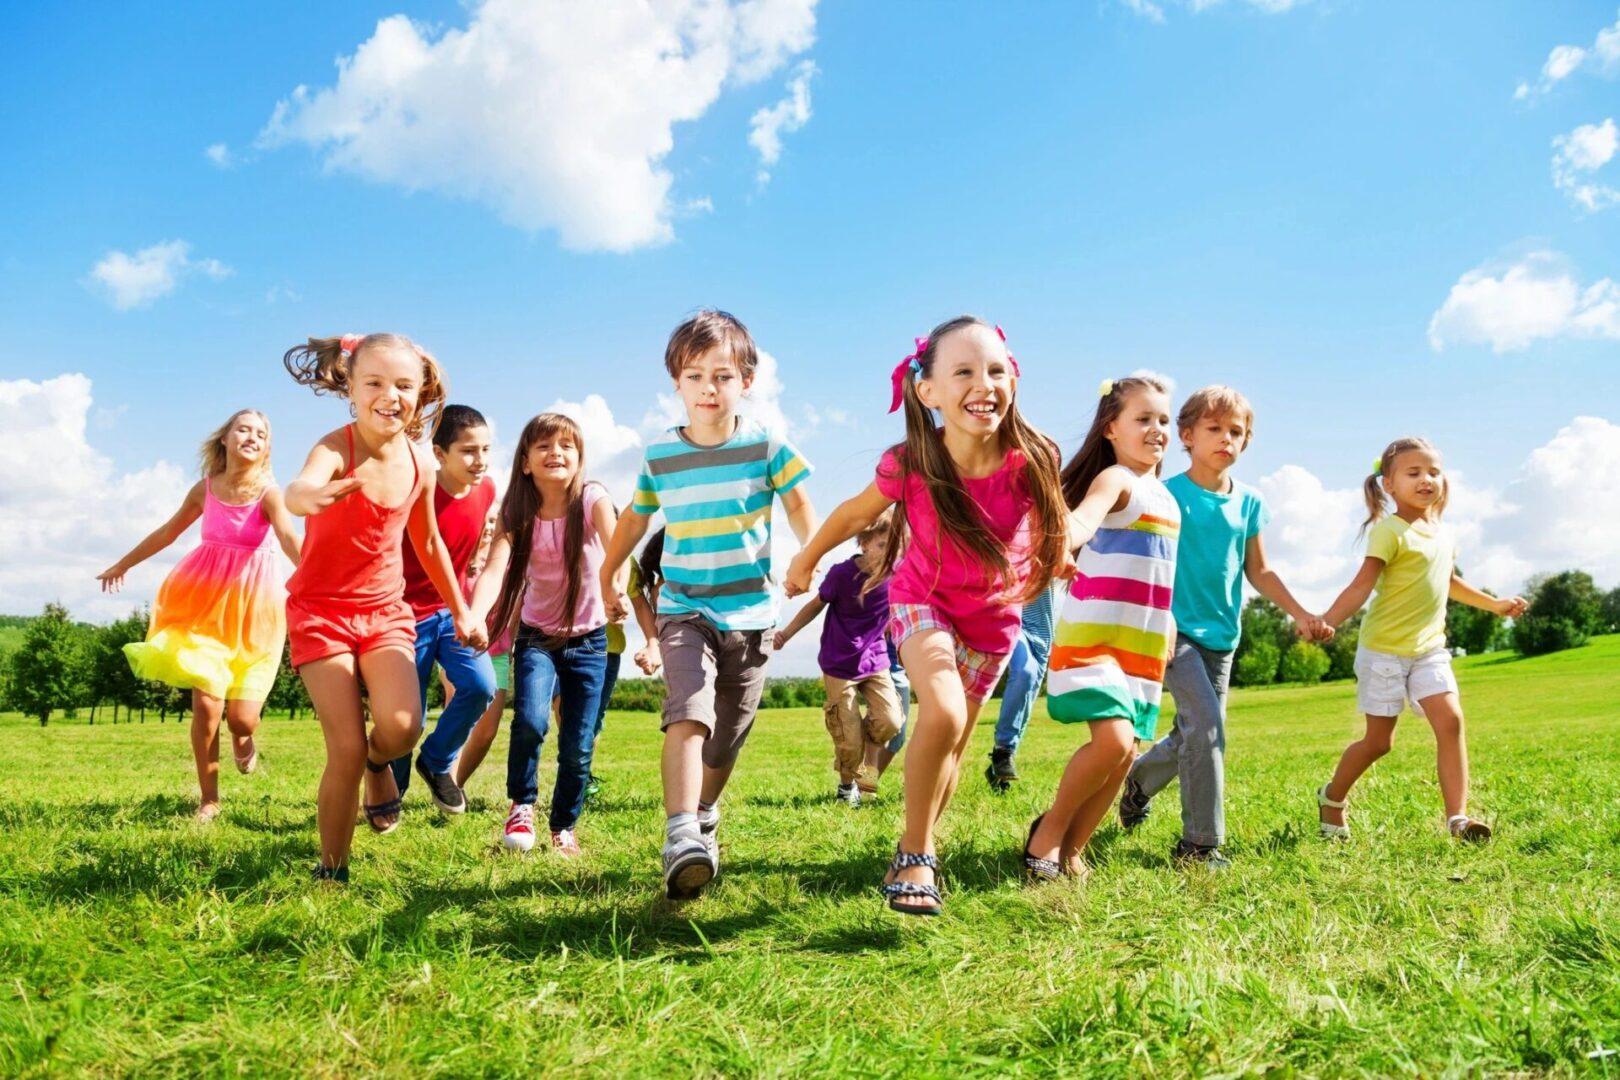 11 Children running on the grass